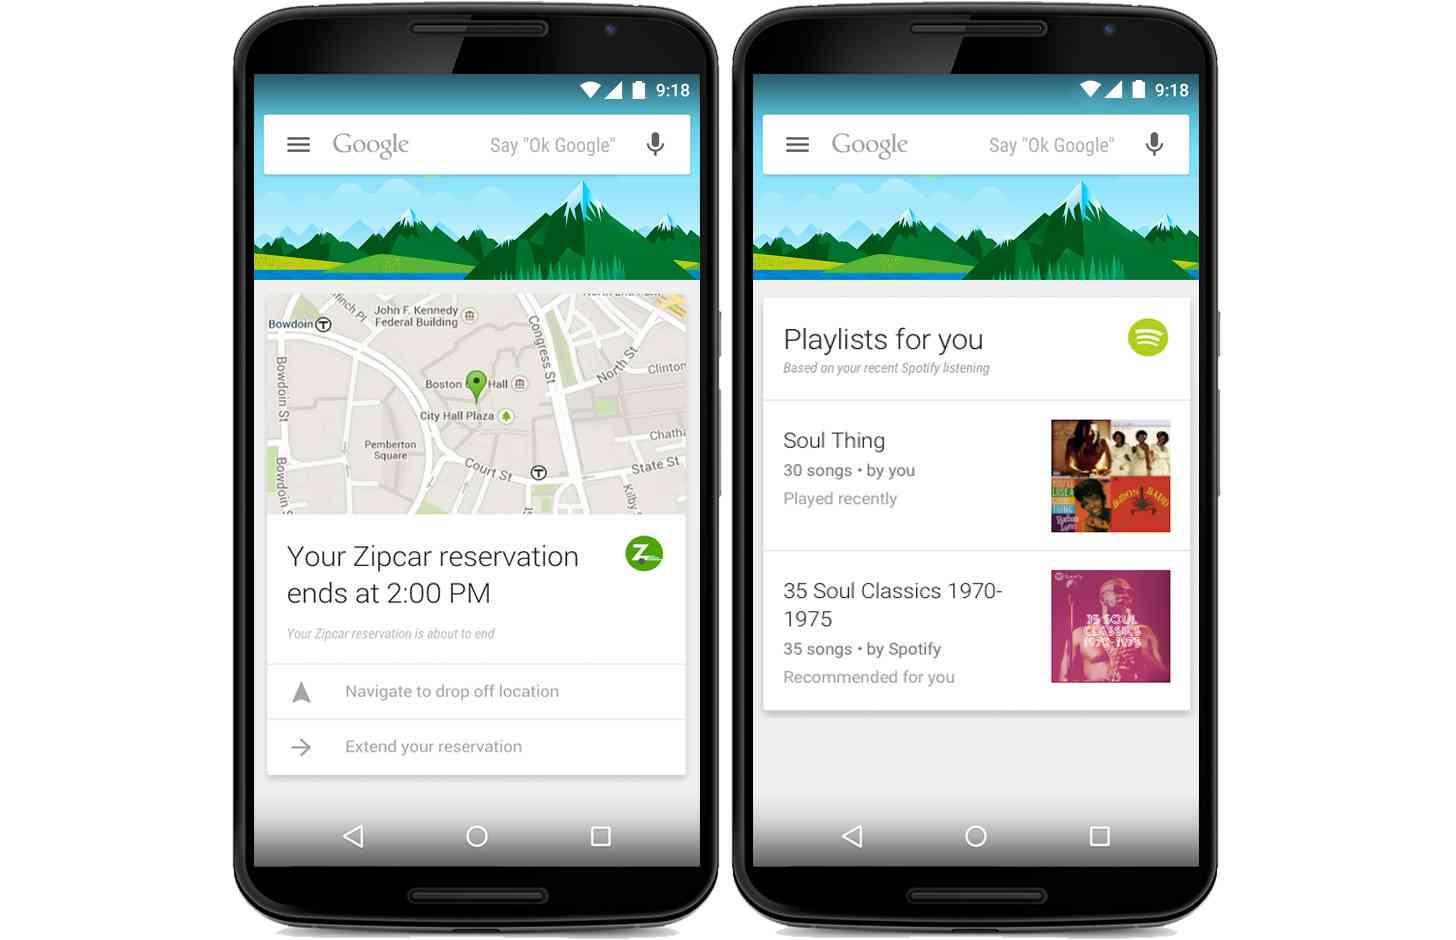 Google Now Zipcar, Spotify app integration